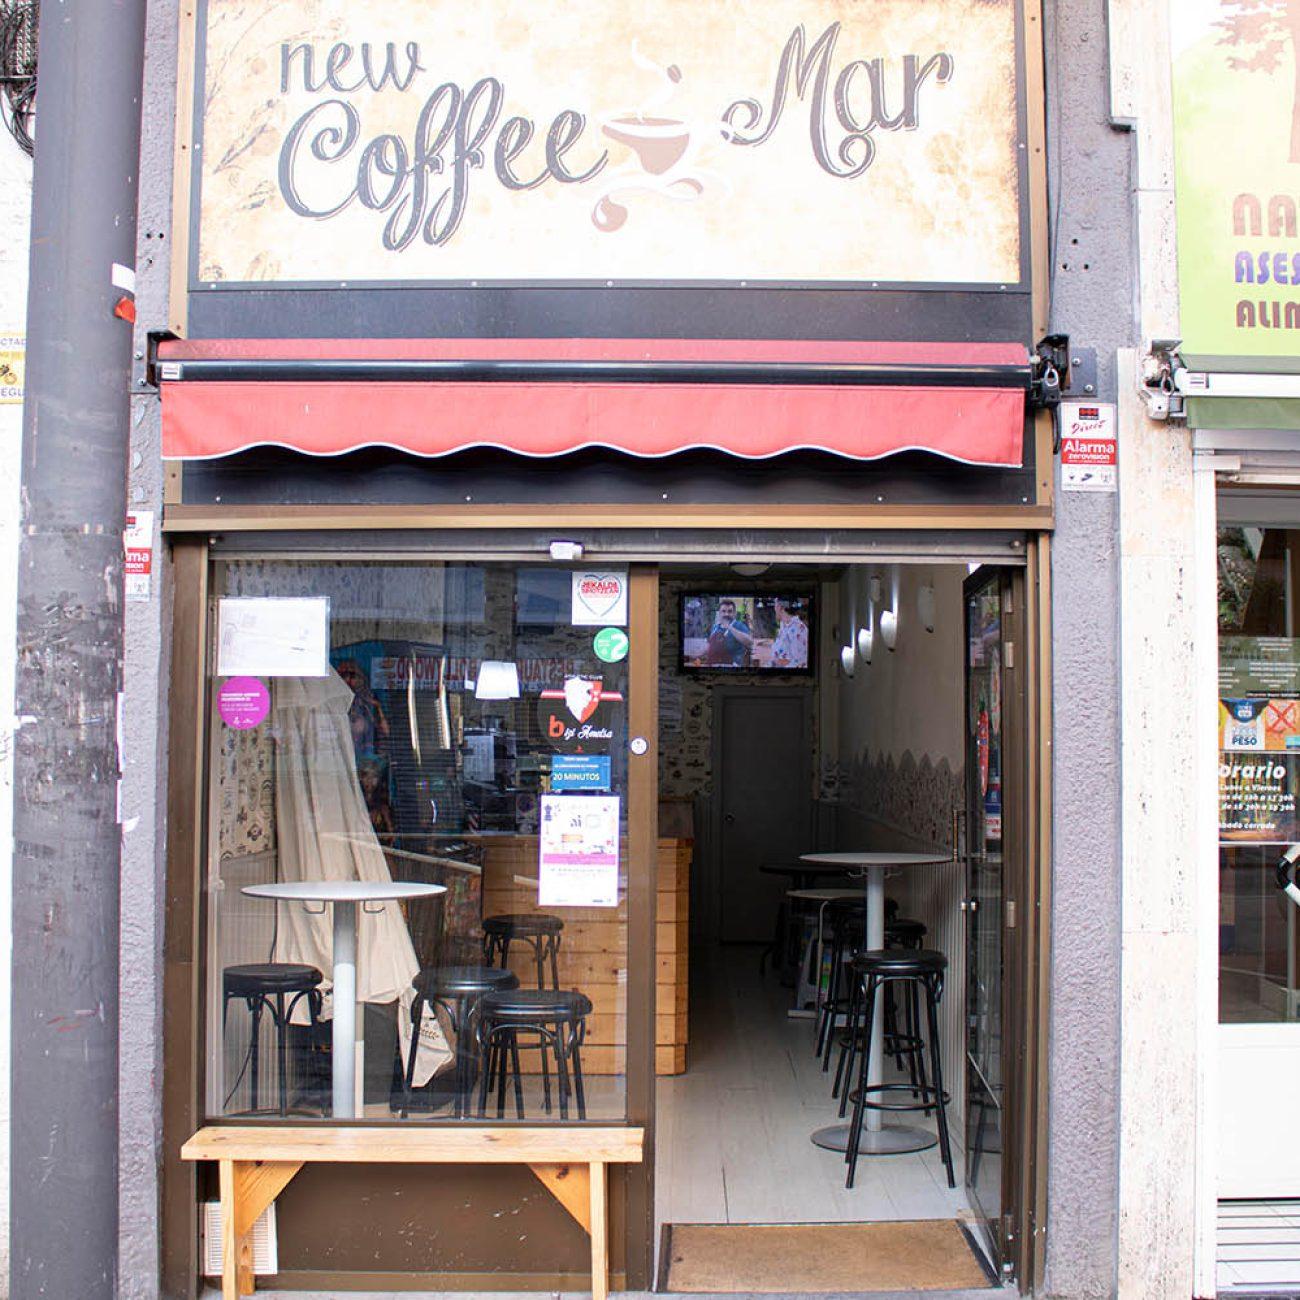 NEW COFFEE MAR